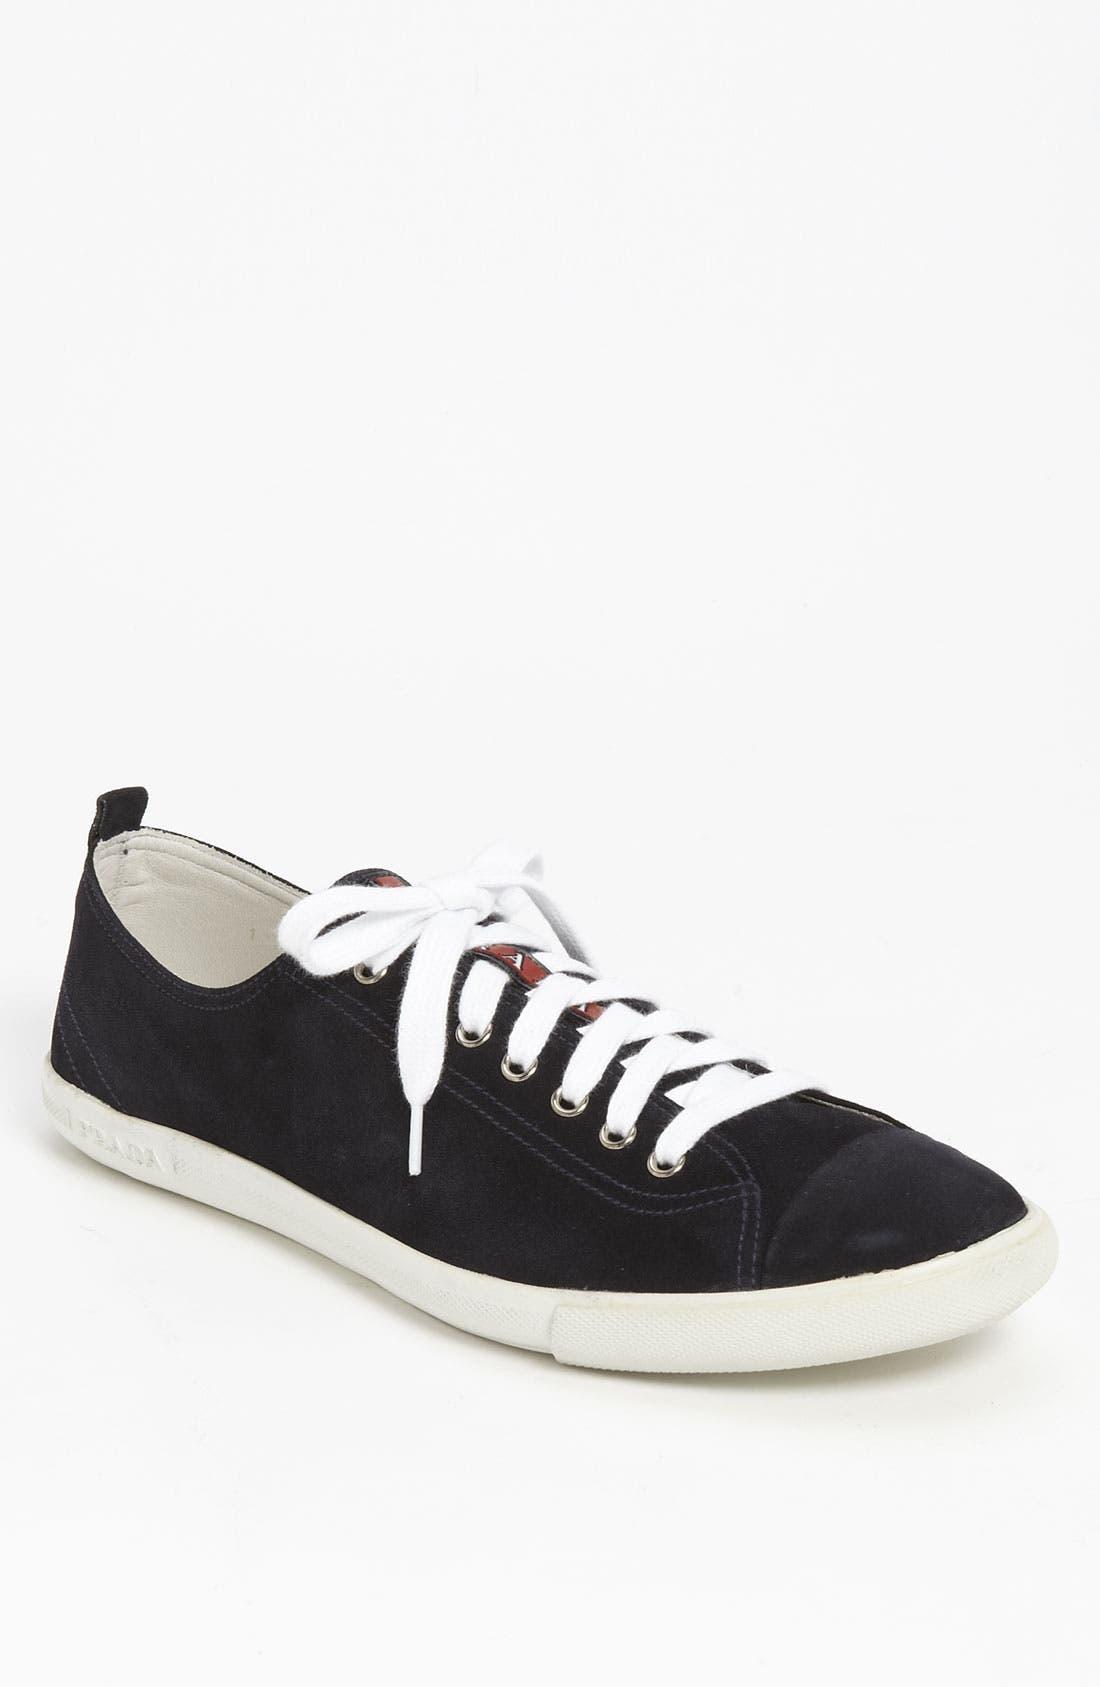 Alternate Image 1 Selected - Prada Low Profile Suede Sneaker